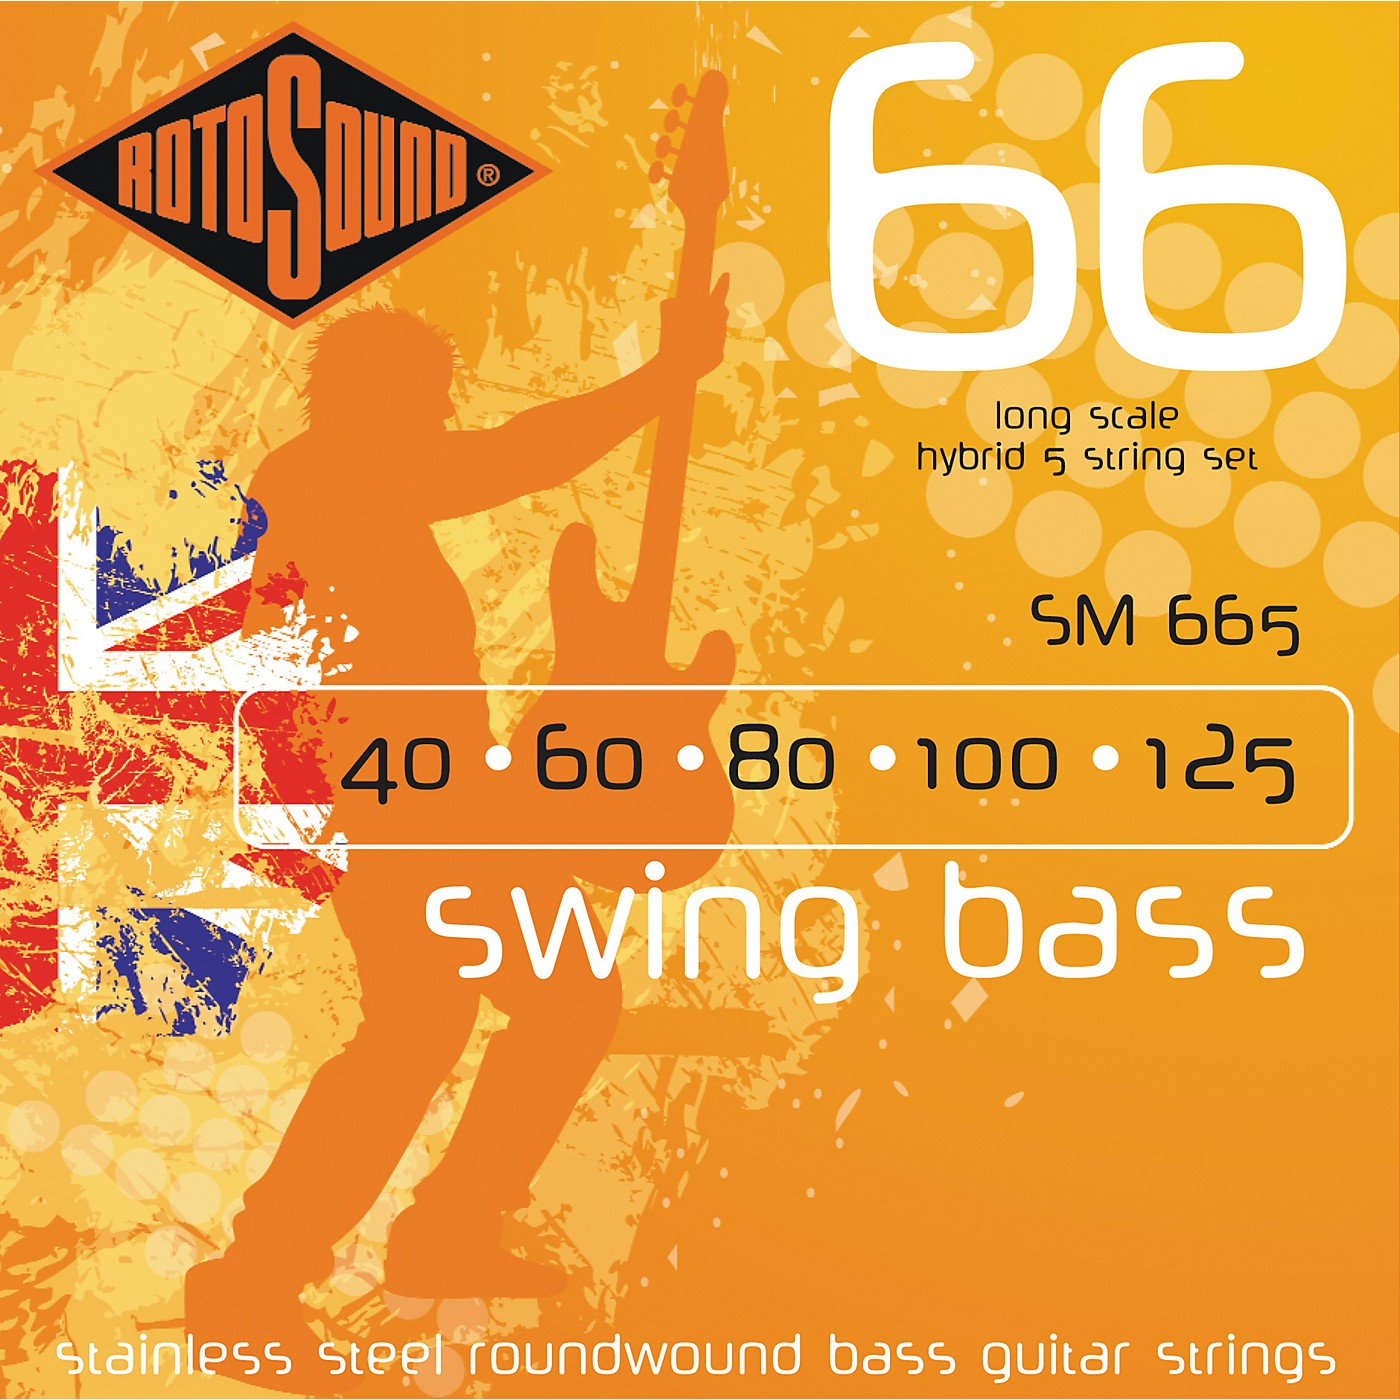 Rotosound SM665 Swing Bass 5-String RoundwoundBass Strings thumbnail